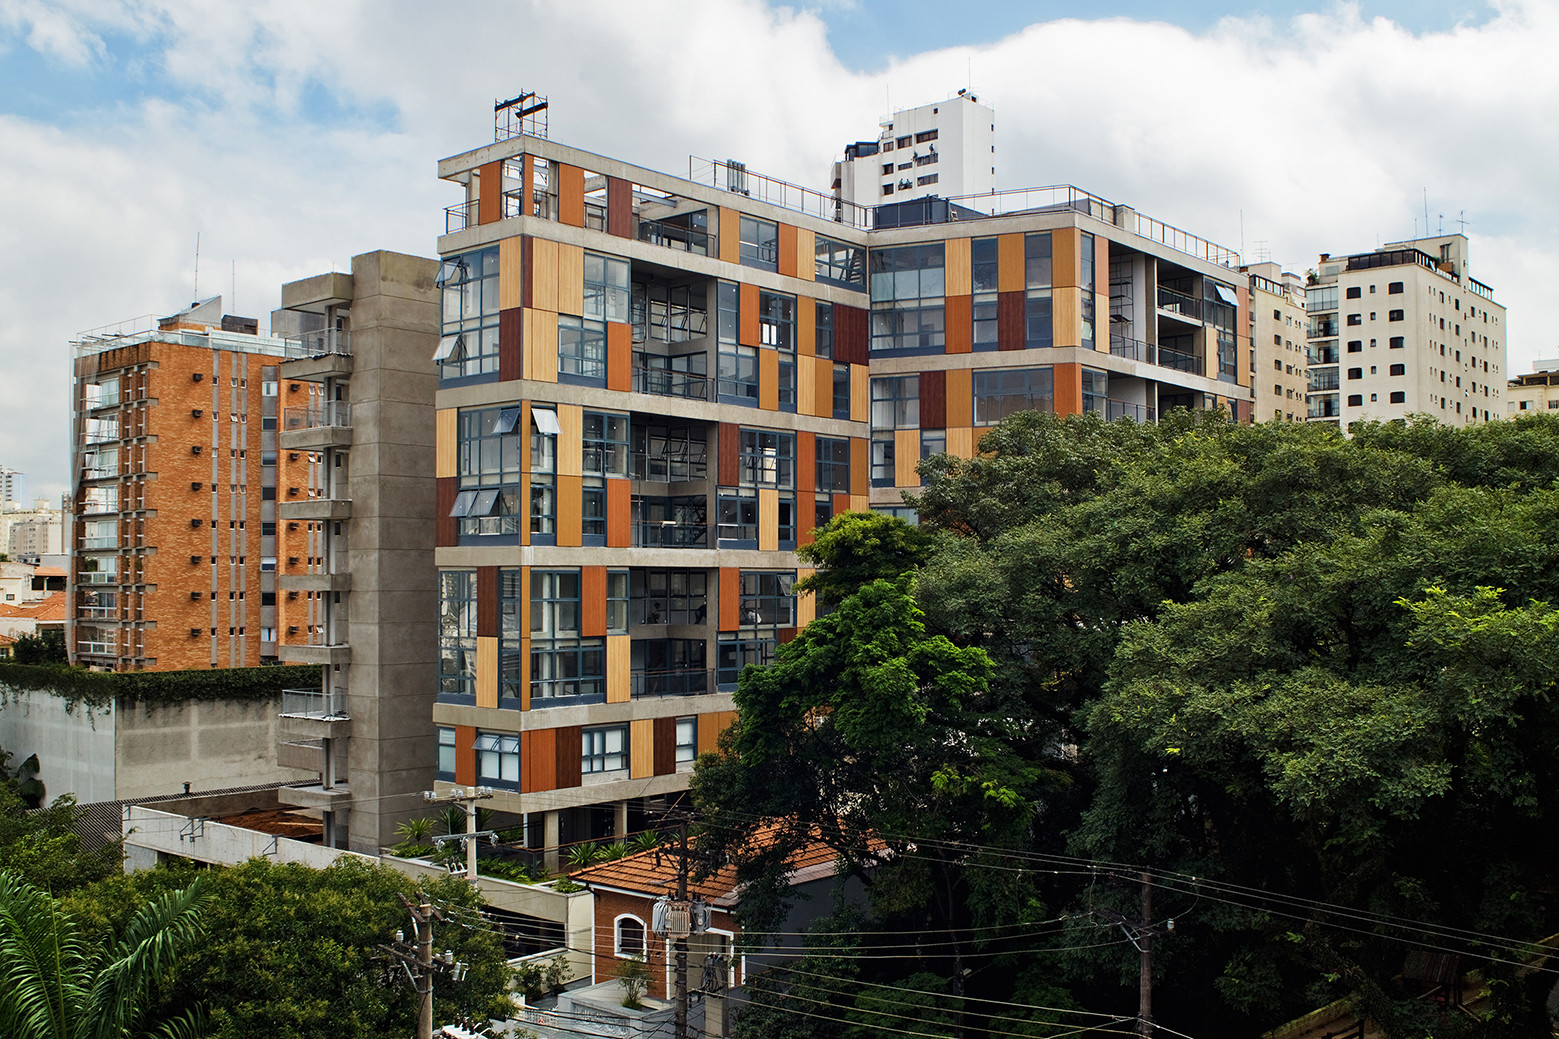 Galeria de edif cio fidalga andrade morettin arquitetos for Andrade morettin